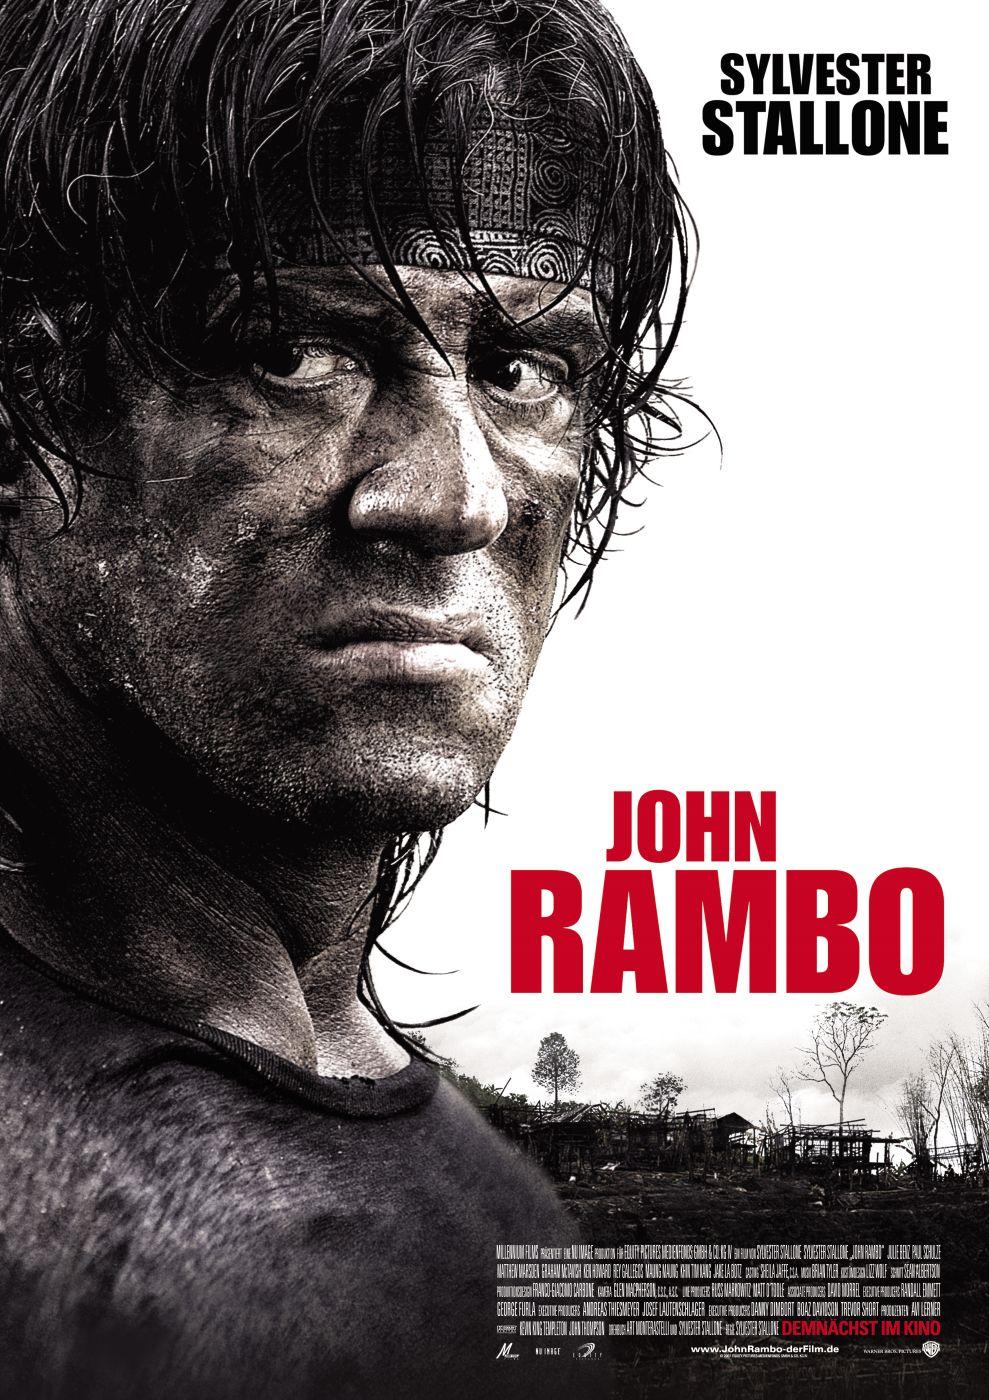 John Rambo Filmes Cinema Filme E Filmes Hd